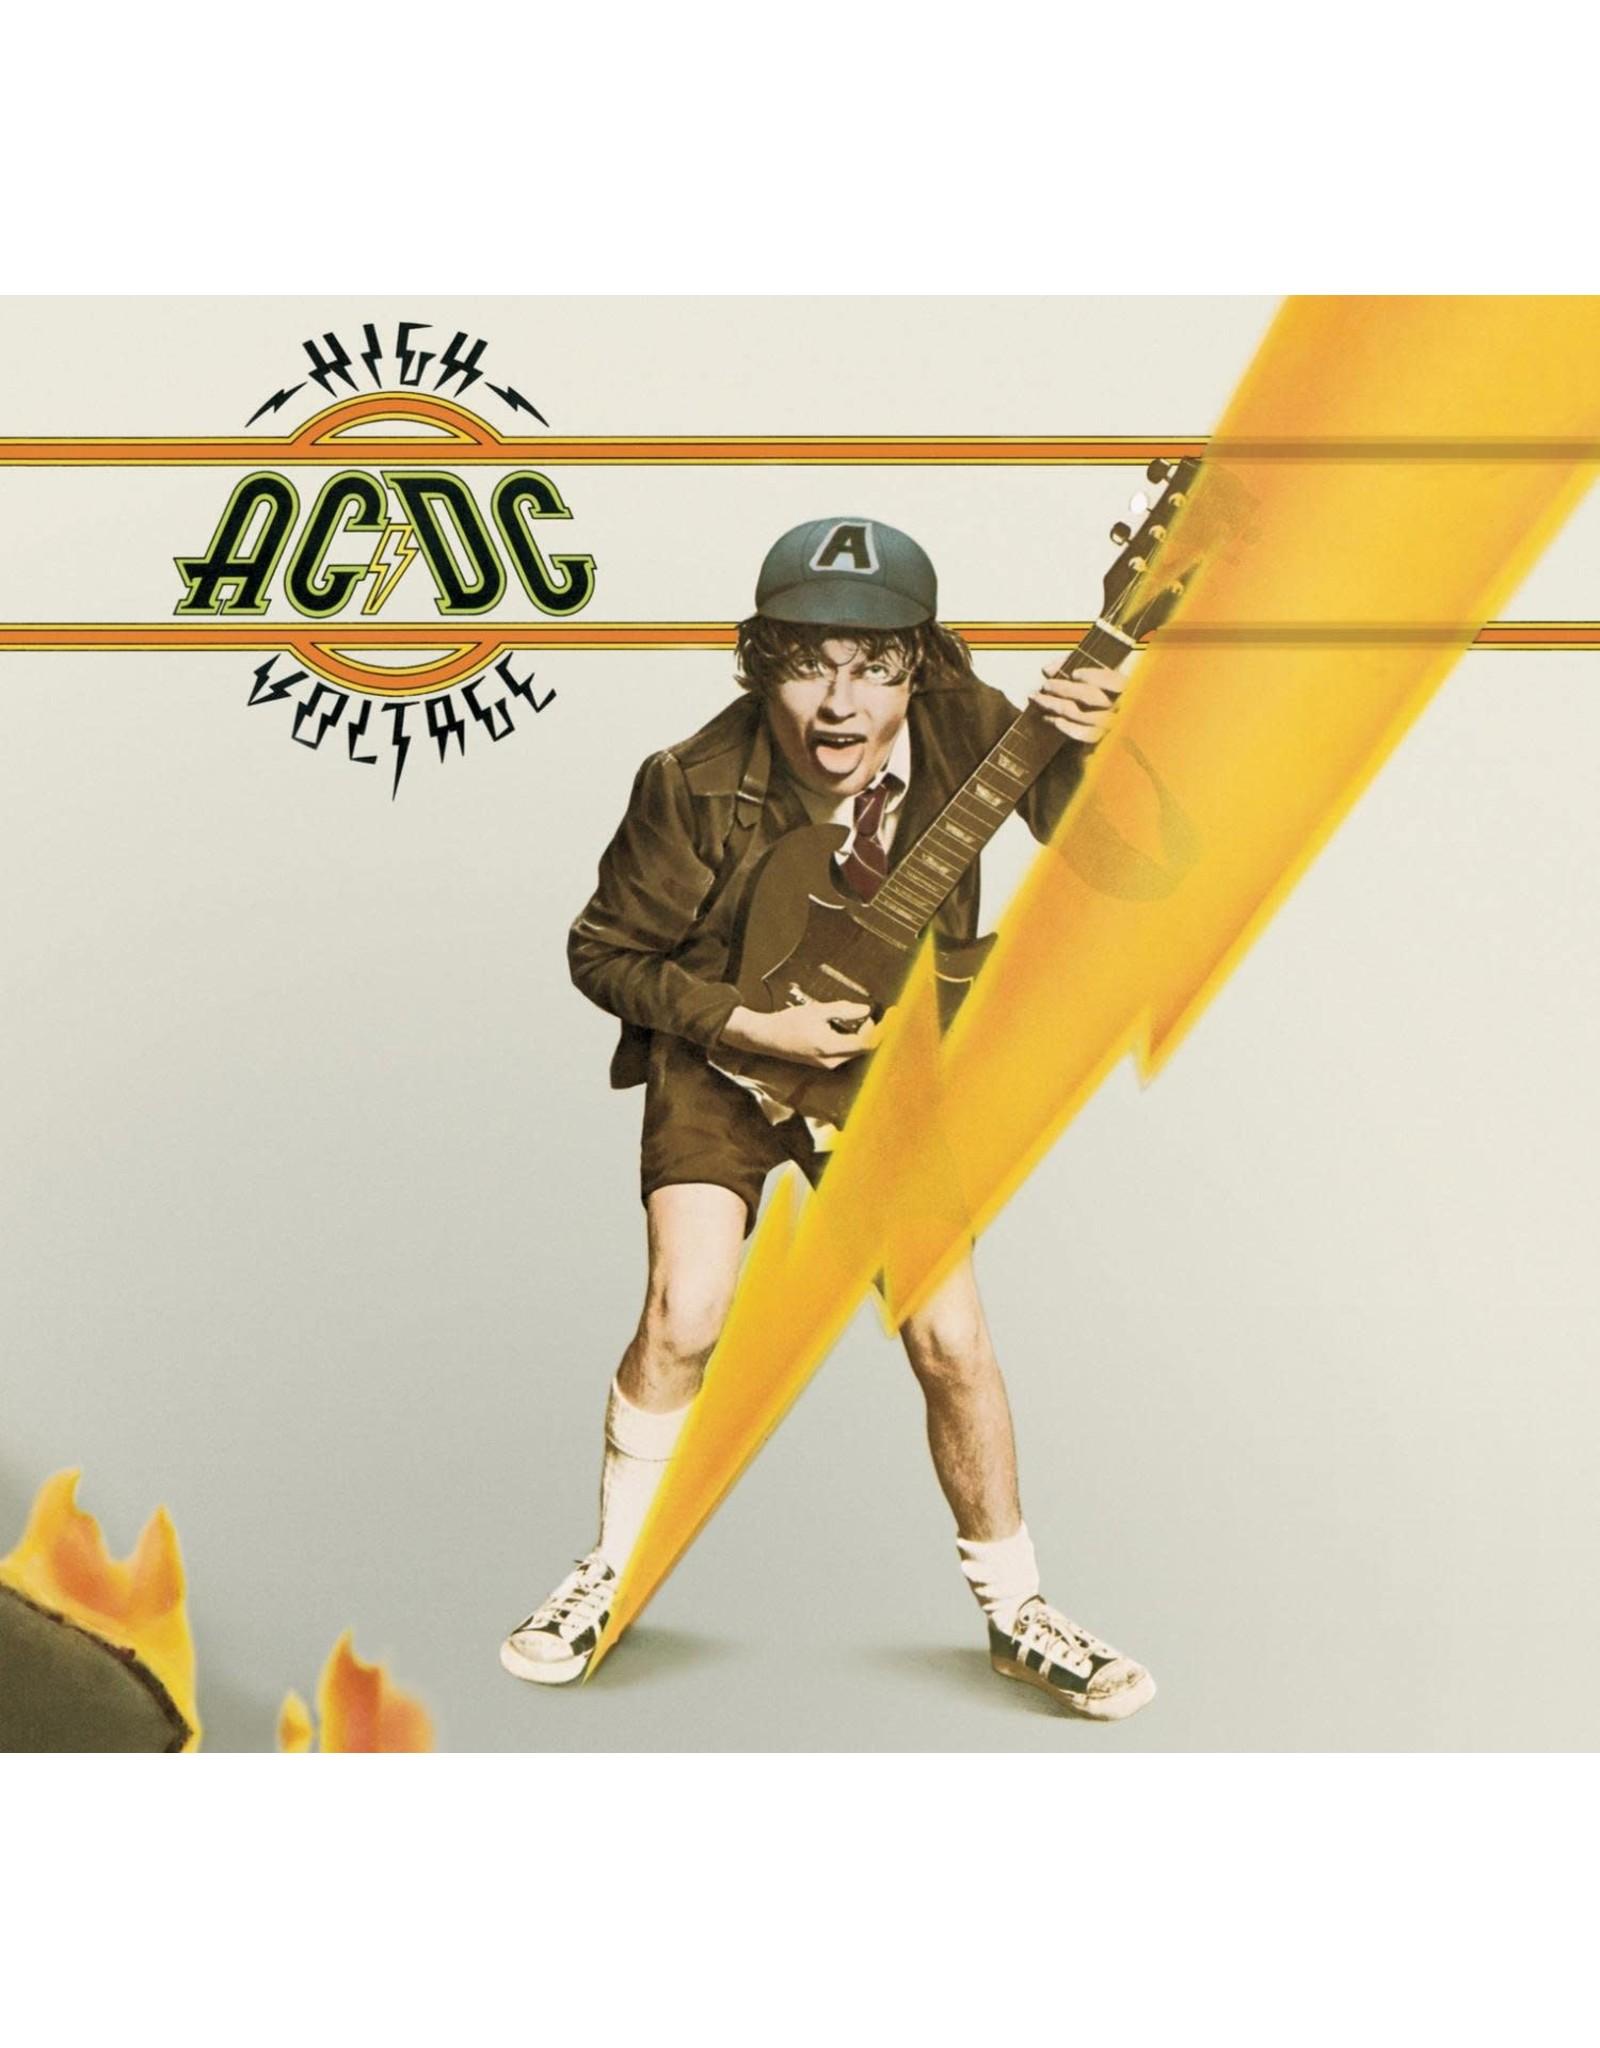 AC/DC - High Voltage (1976, Vinyl) | Discogs